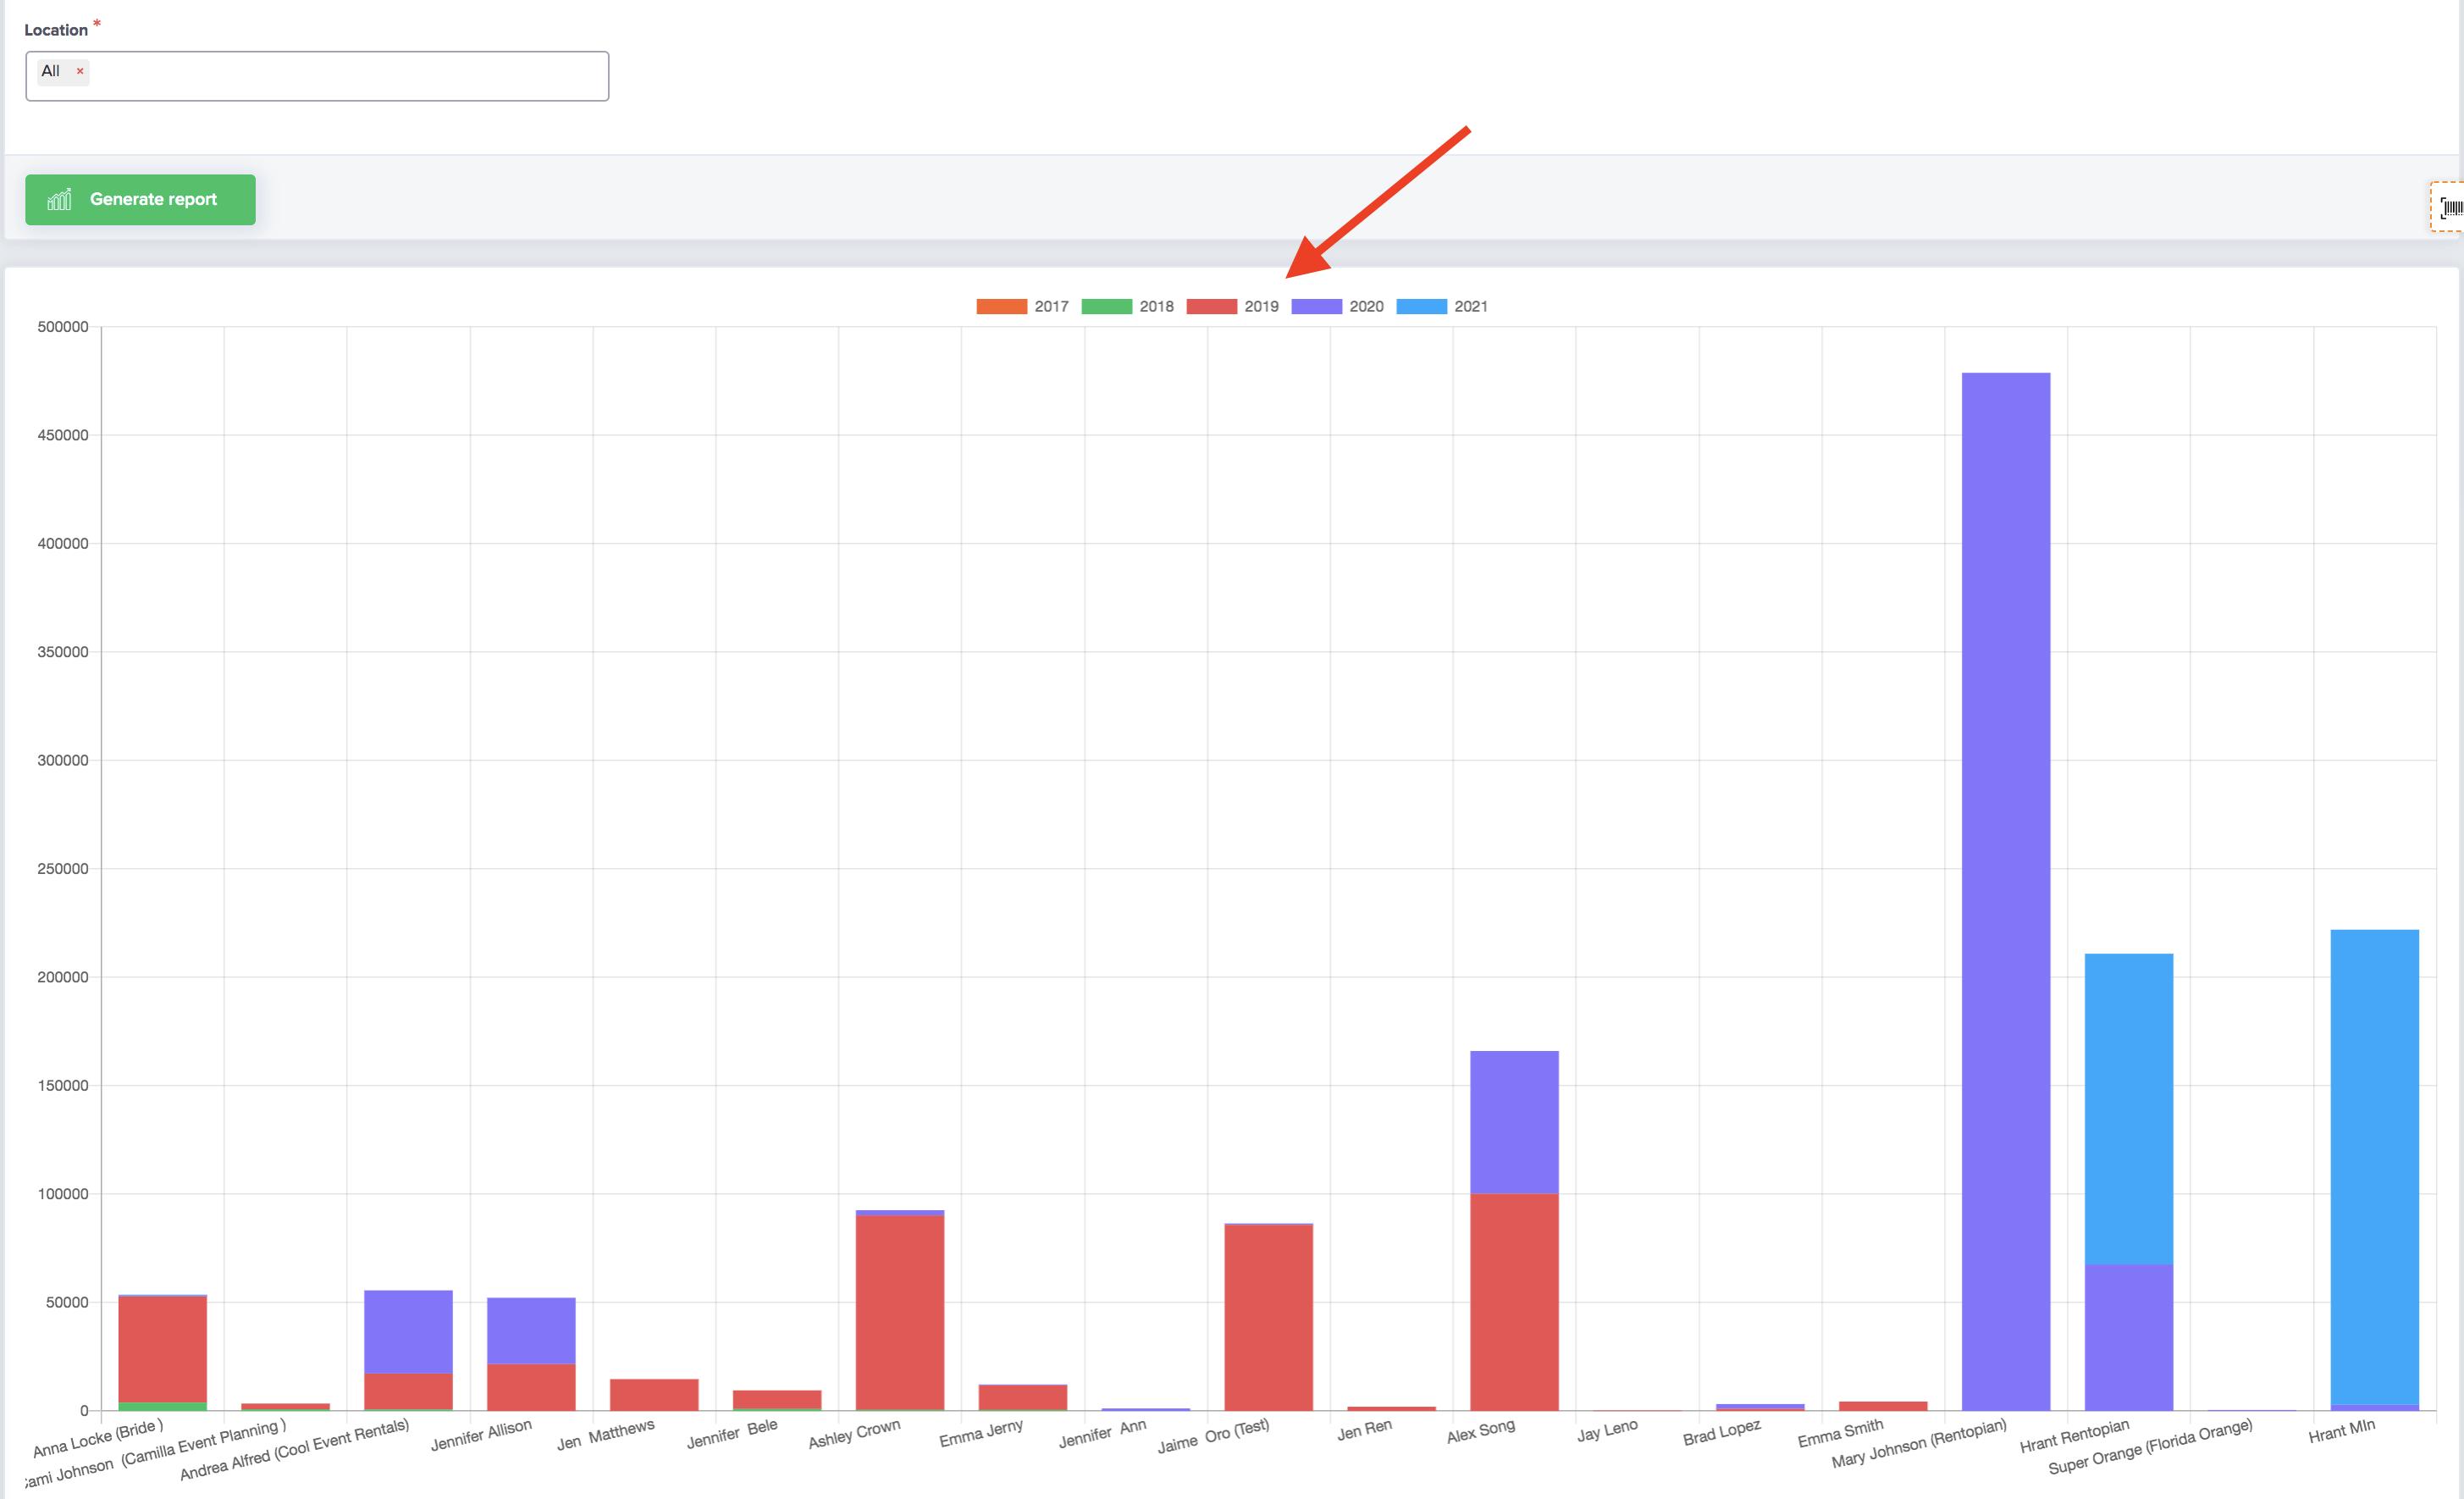 client spending bar graph on event rental software